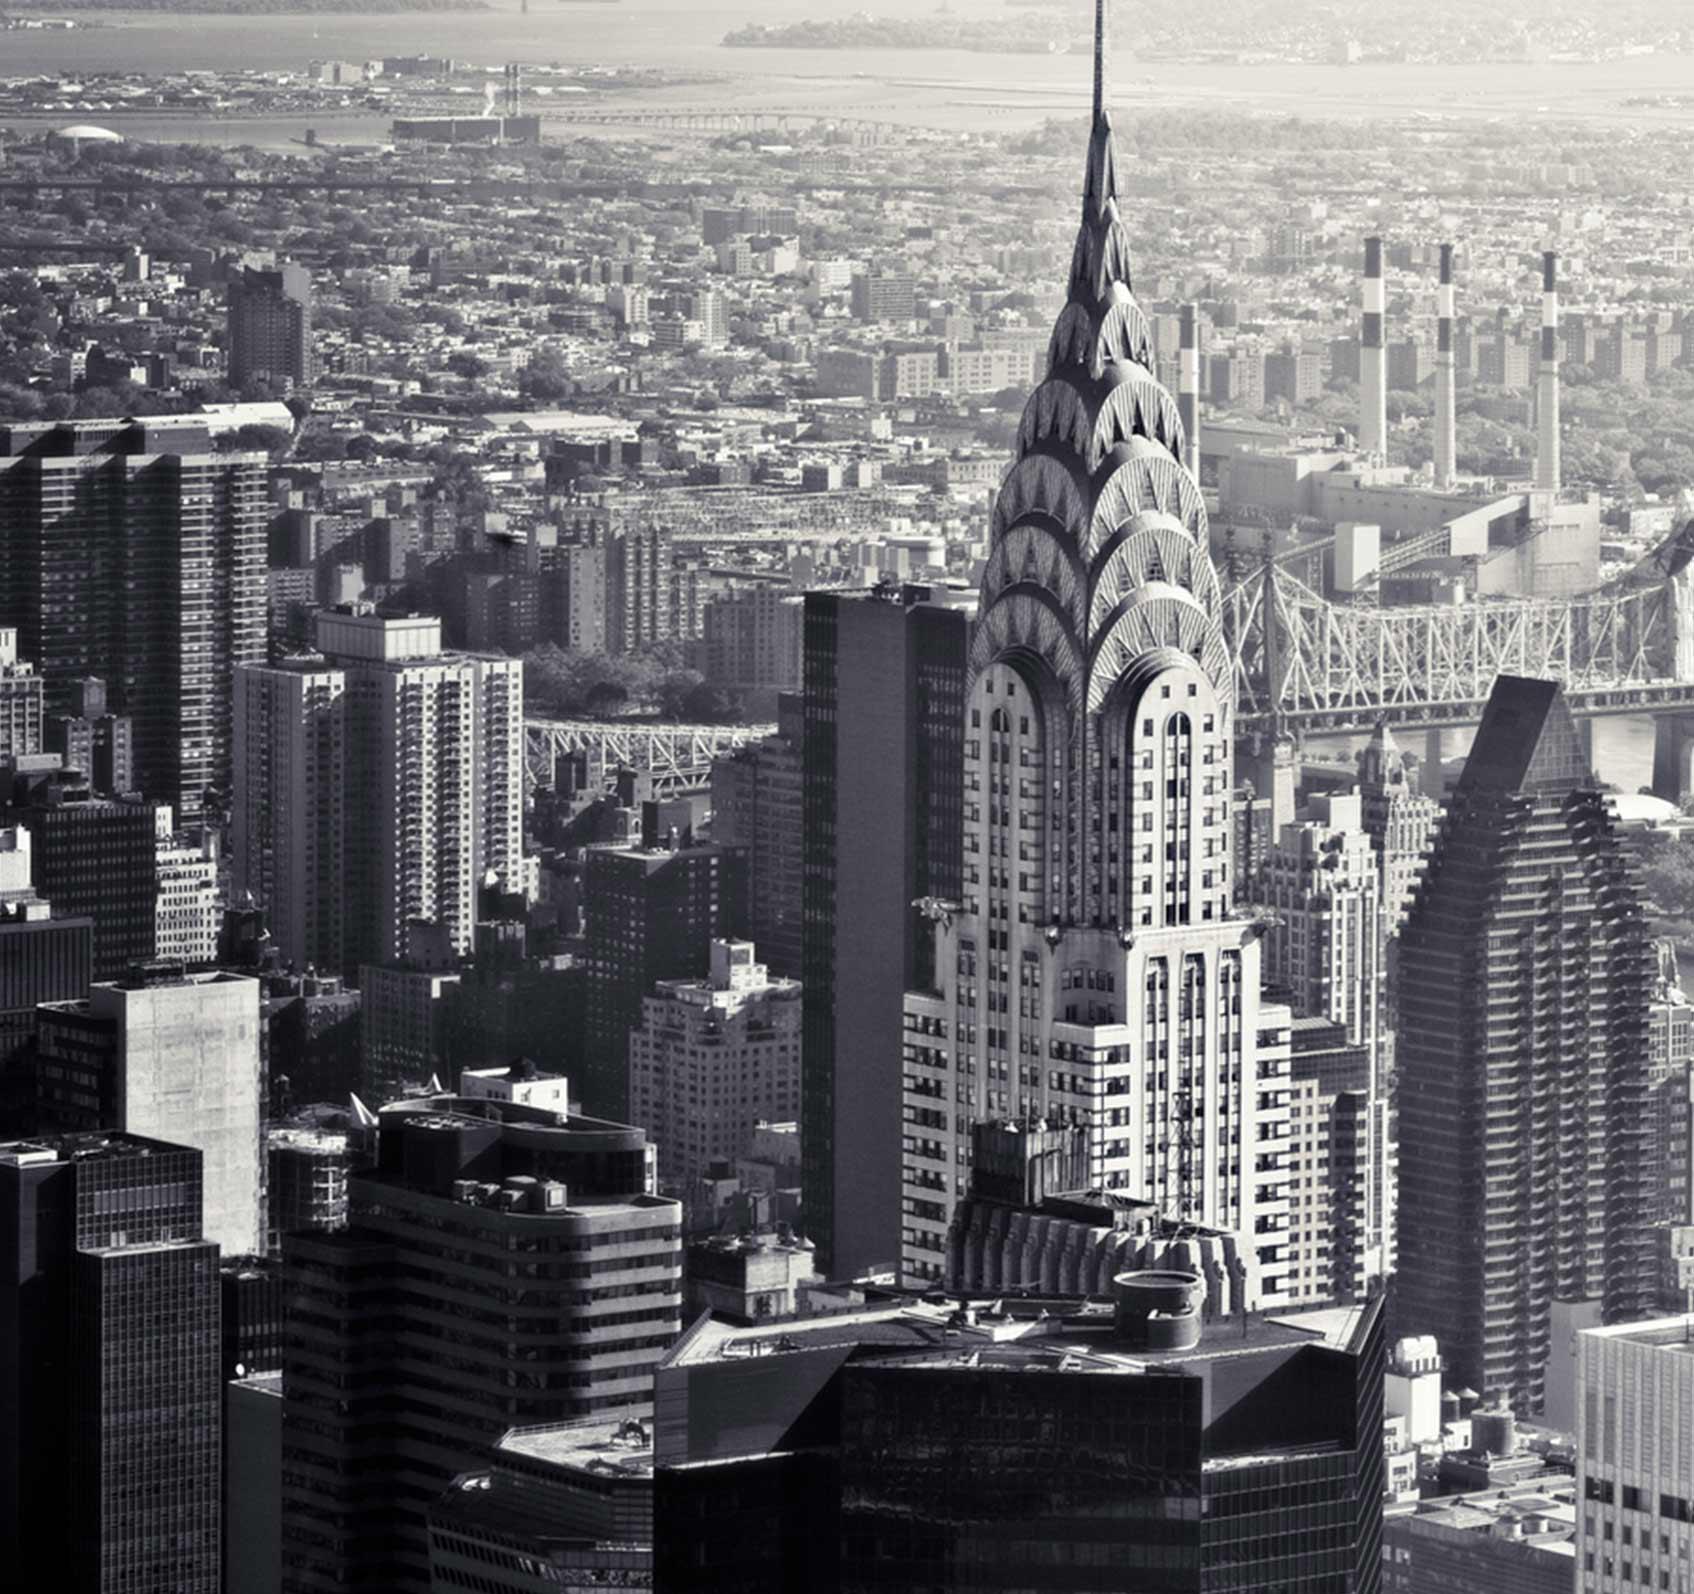 Tour Chrysler, New York